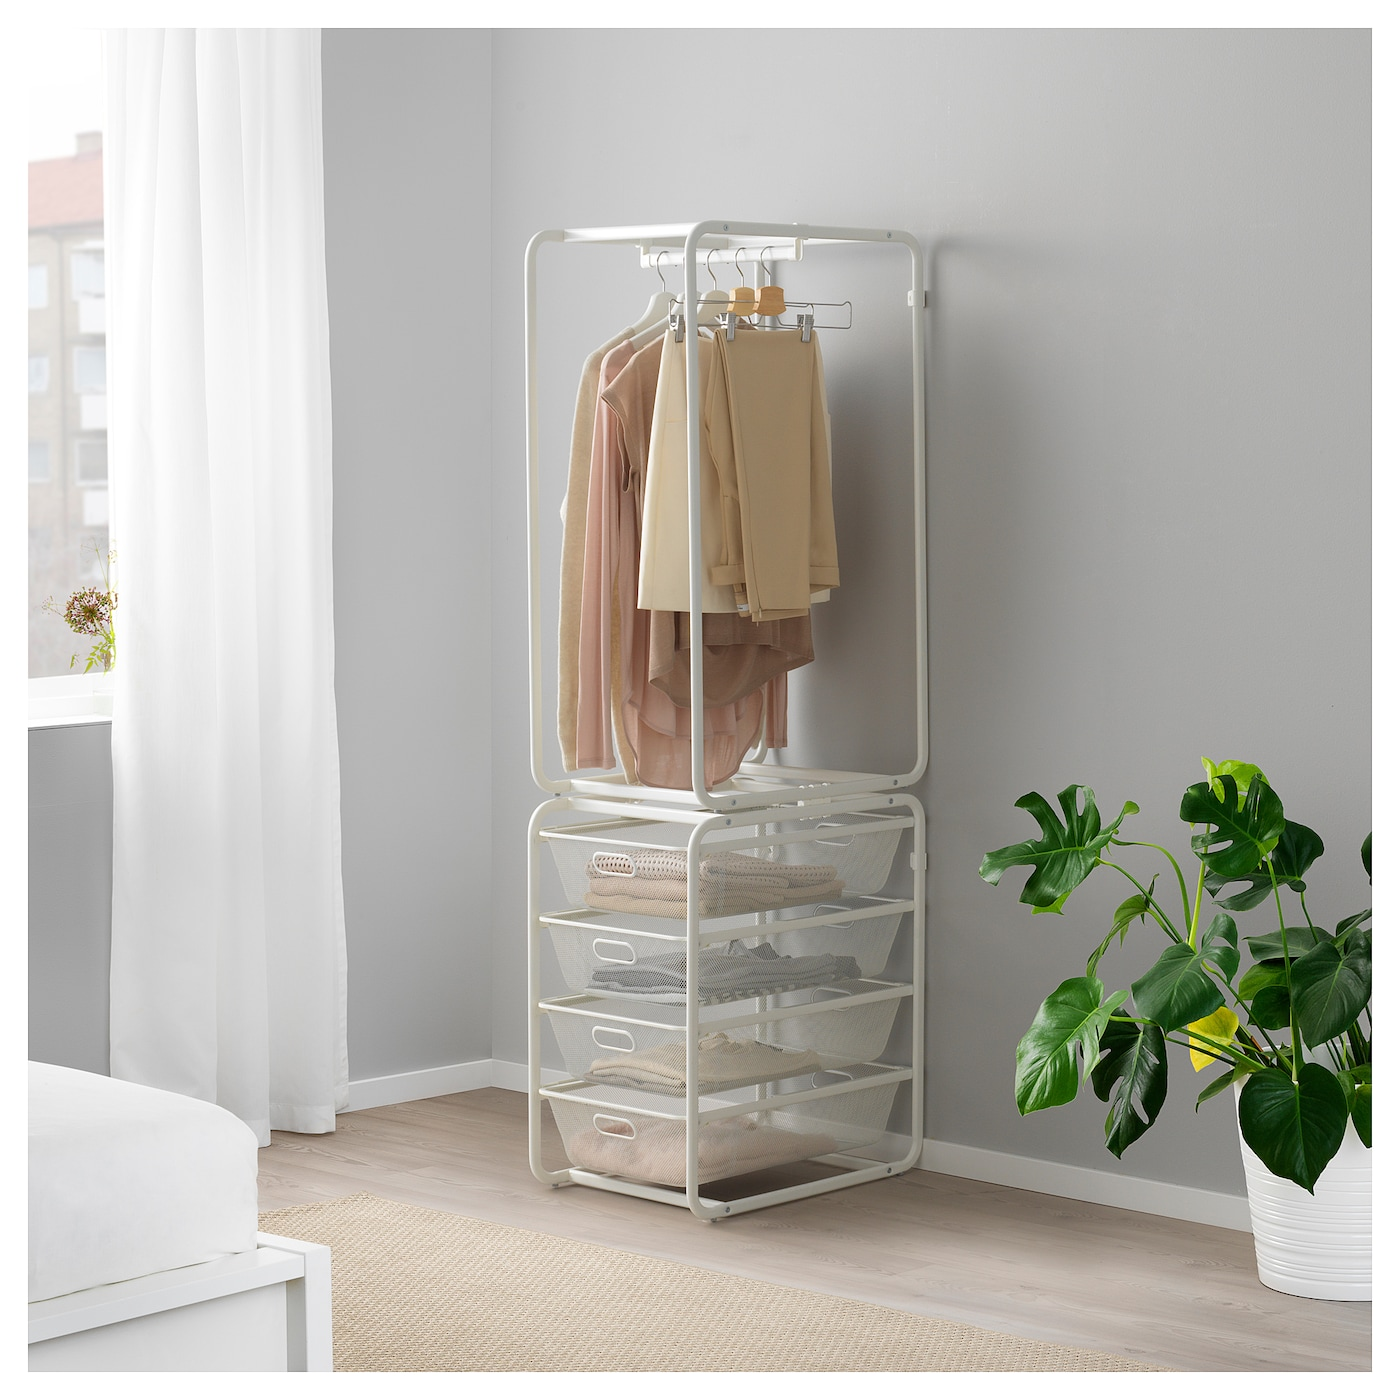 algot structure tringle corbeilles filet blanc 174 cm ikea. Black Bedroom Furniture Sets. Home Design Ideas